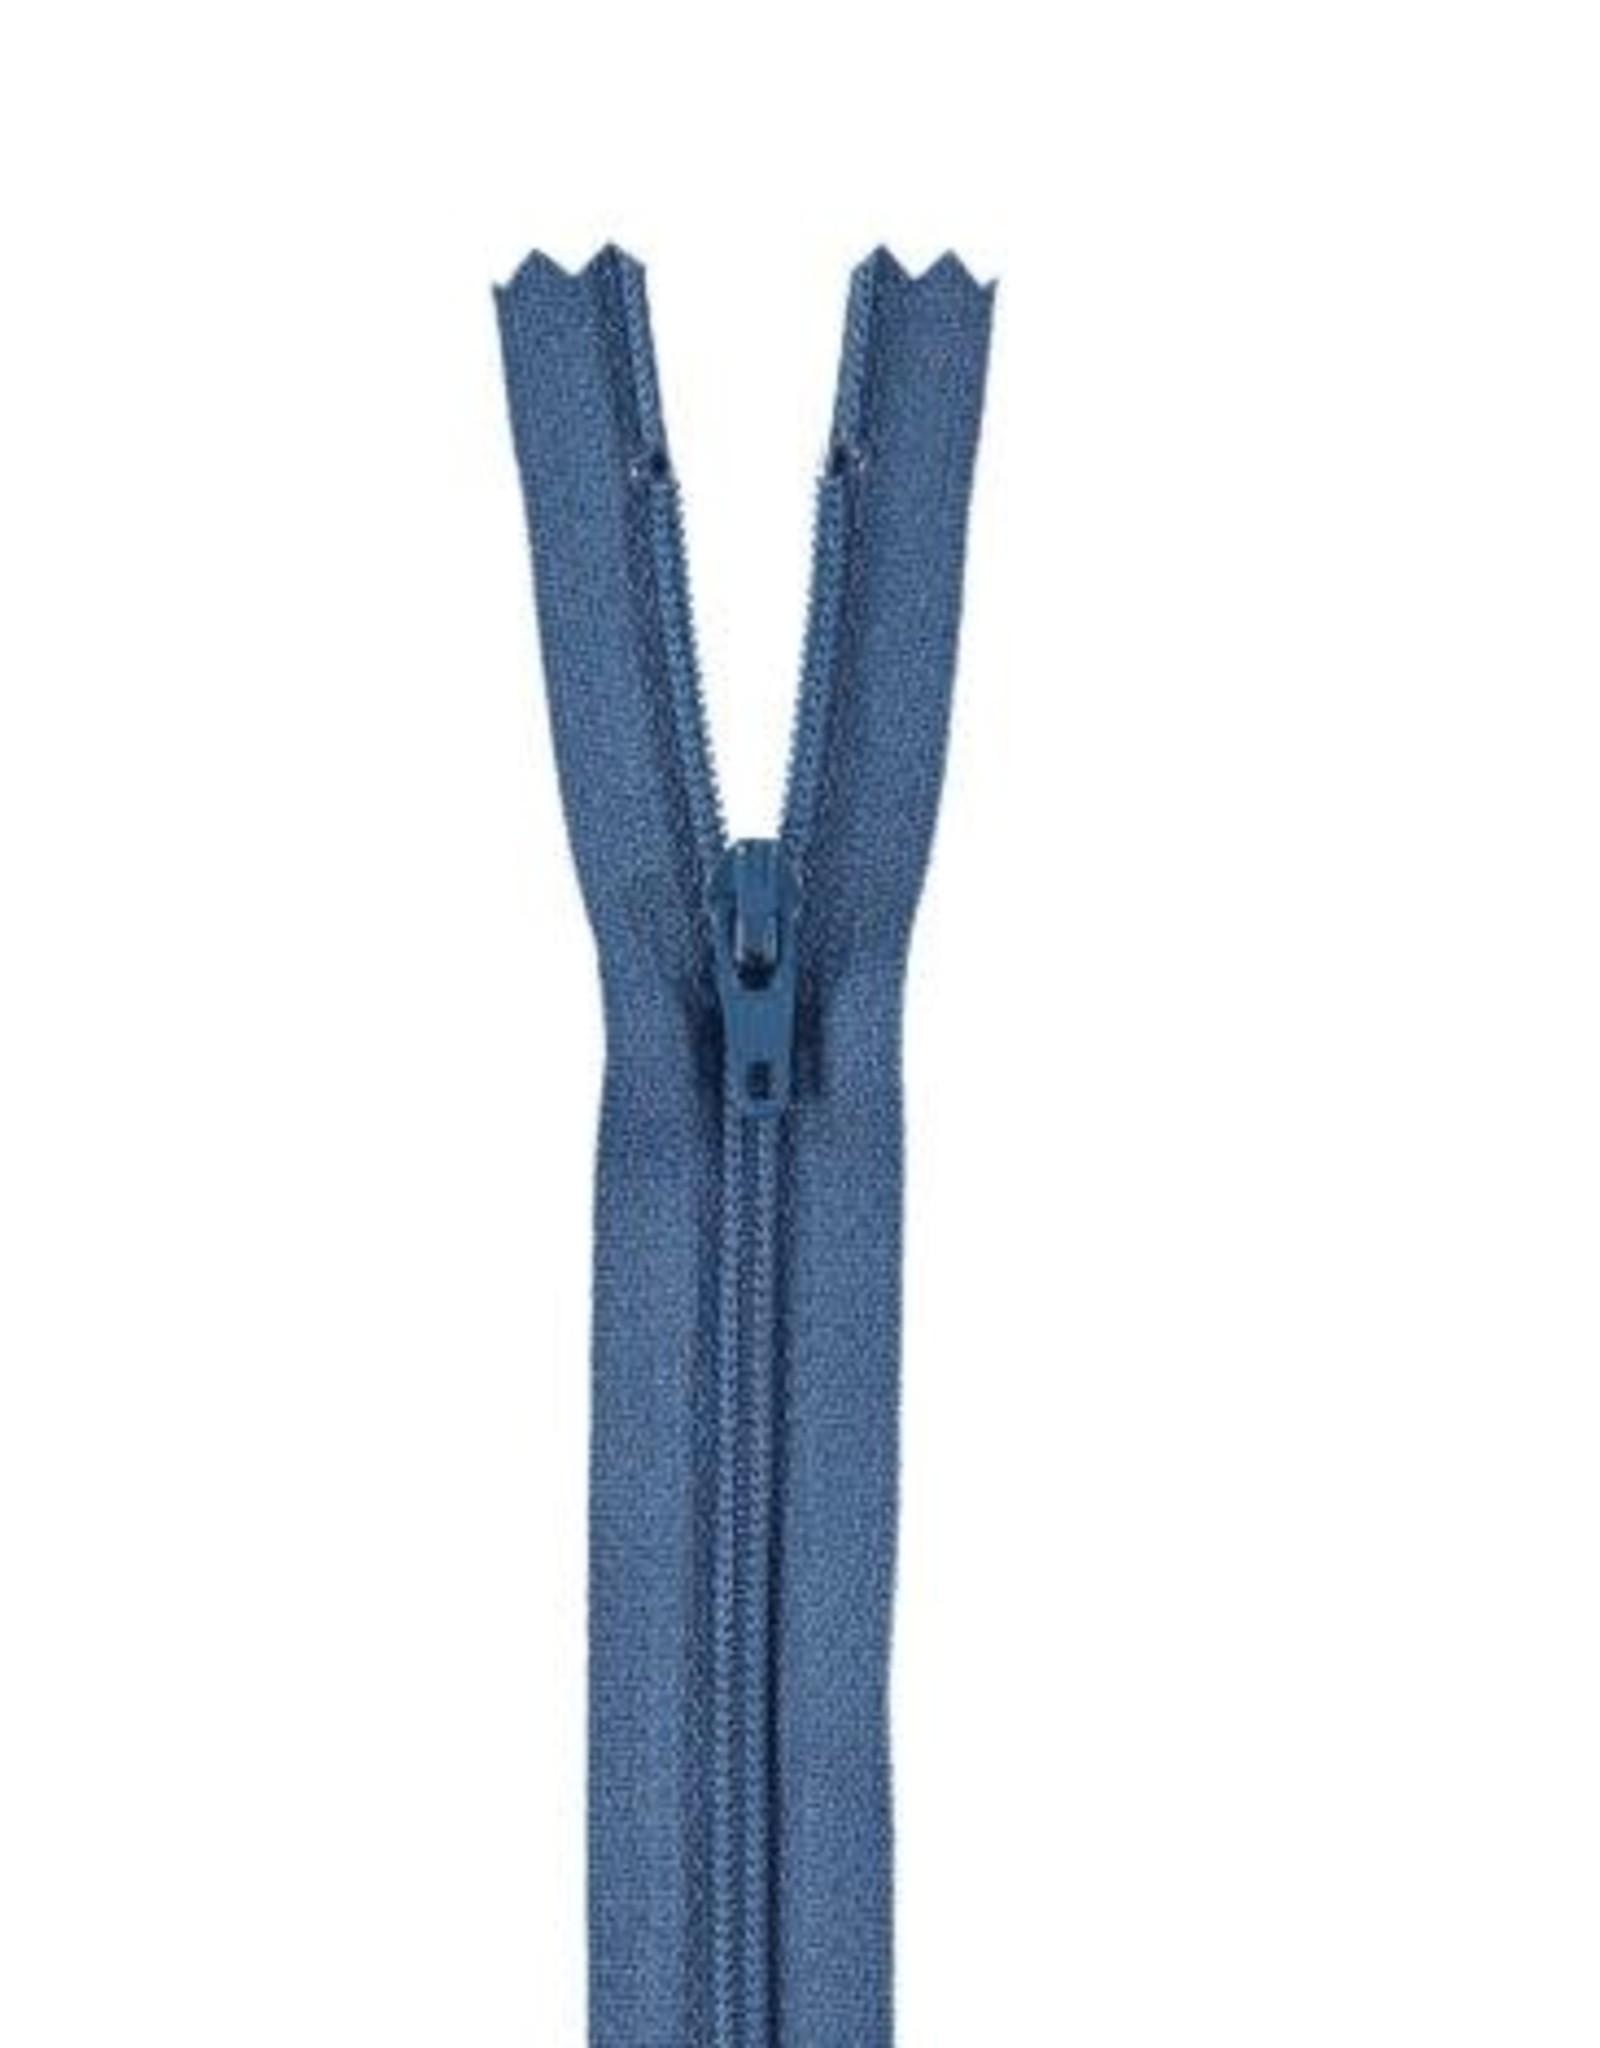 YKK Spiraalrits niet-DB 3mm jeansblauw 839-35cm